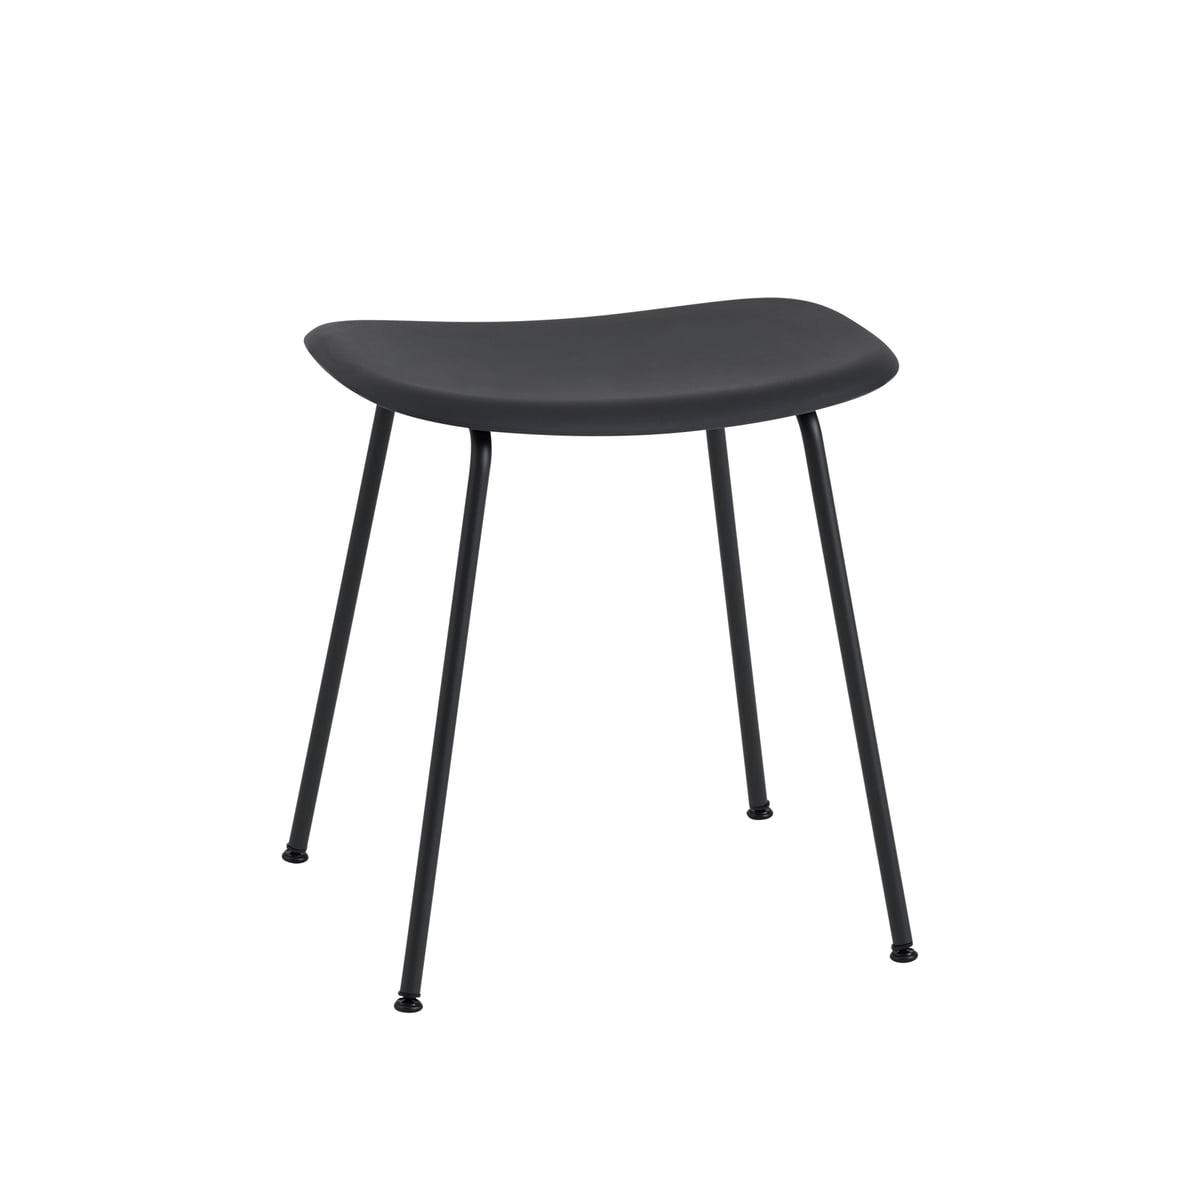 fiber hocker tube base von muuto connox. Black Bedroom Furniture Sets. Home Design Ideas